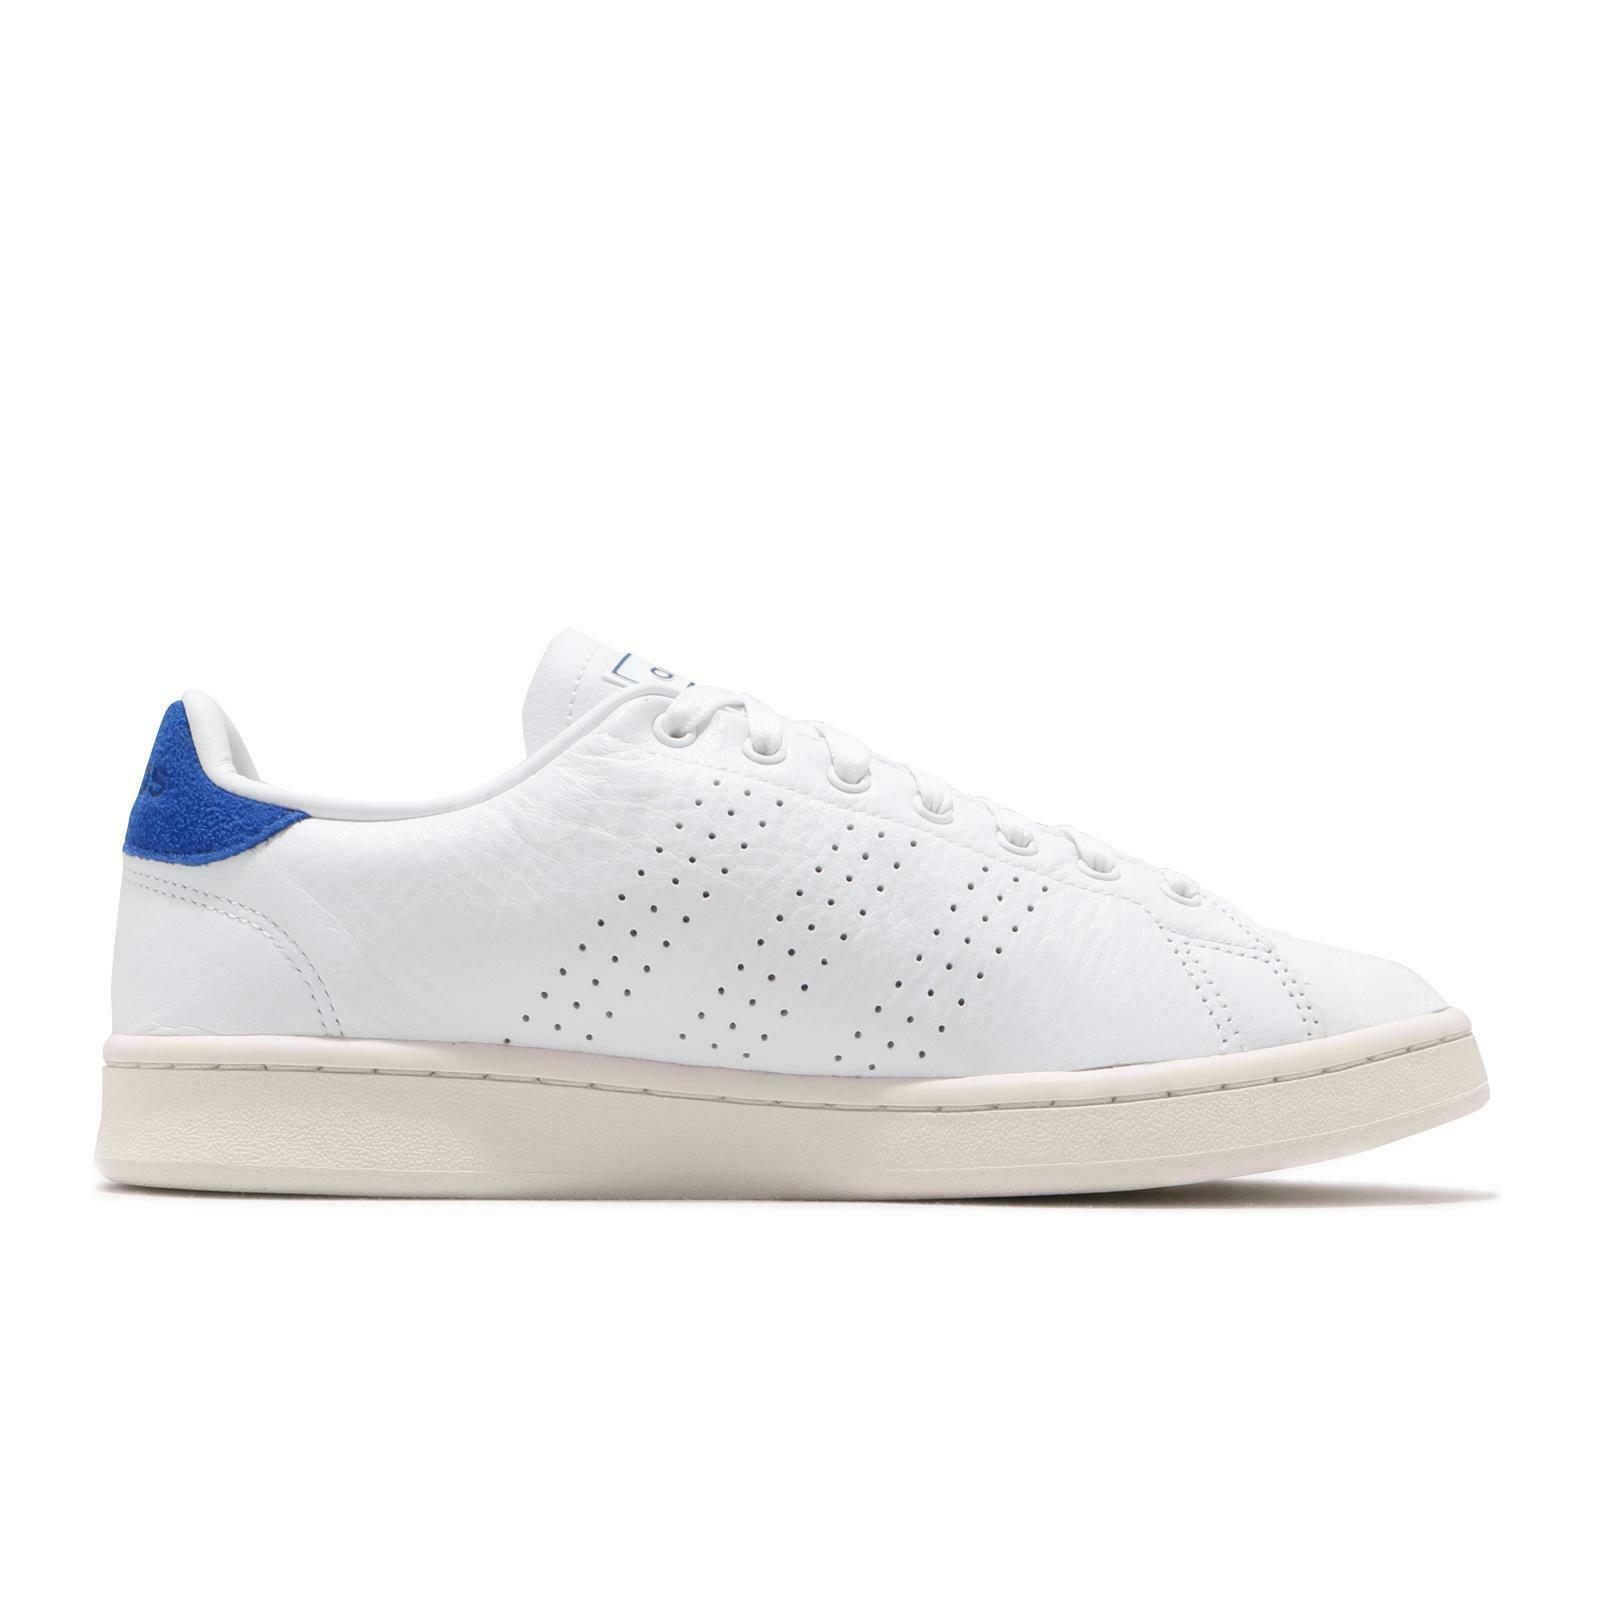 Adidas Advantage Sneakers Ανδρικά Παπούτσια λευκό EG3775  - Λευκό - Size: 40, 45 1/3, 46